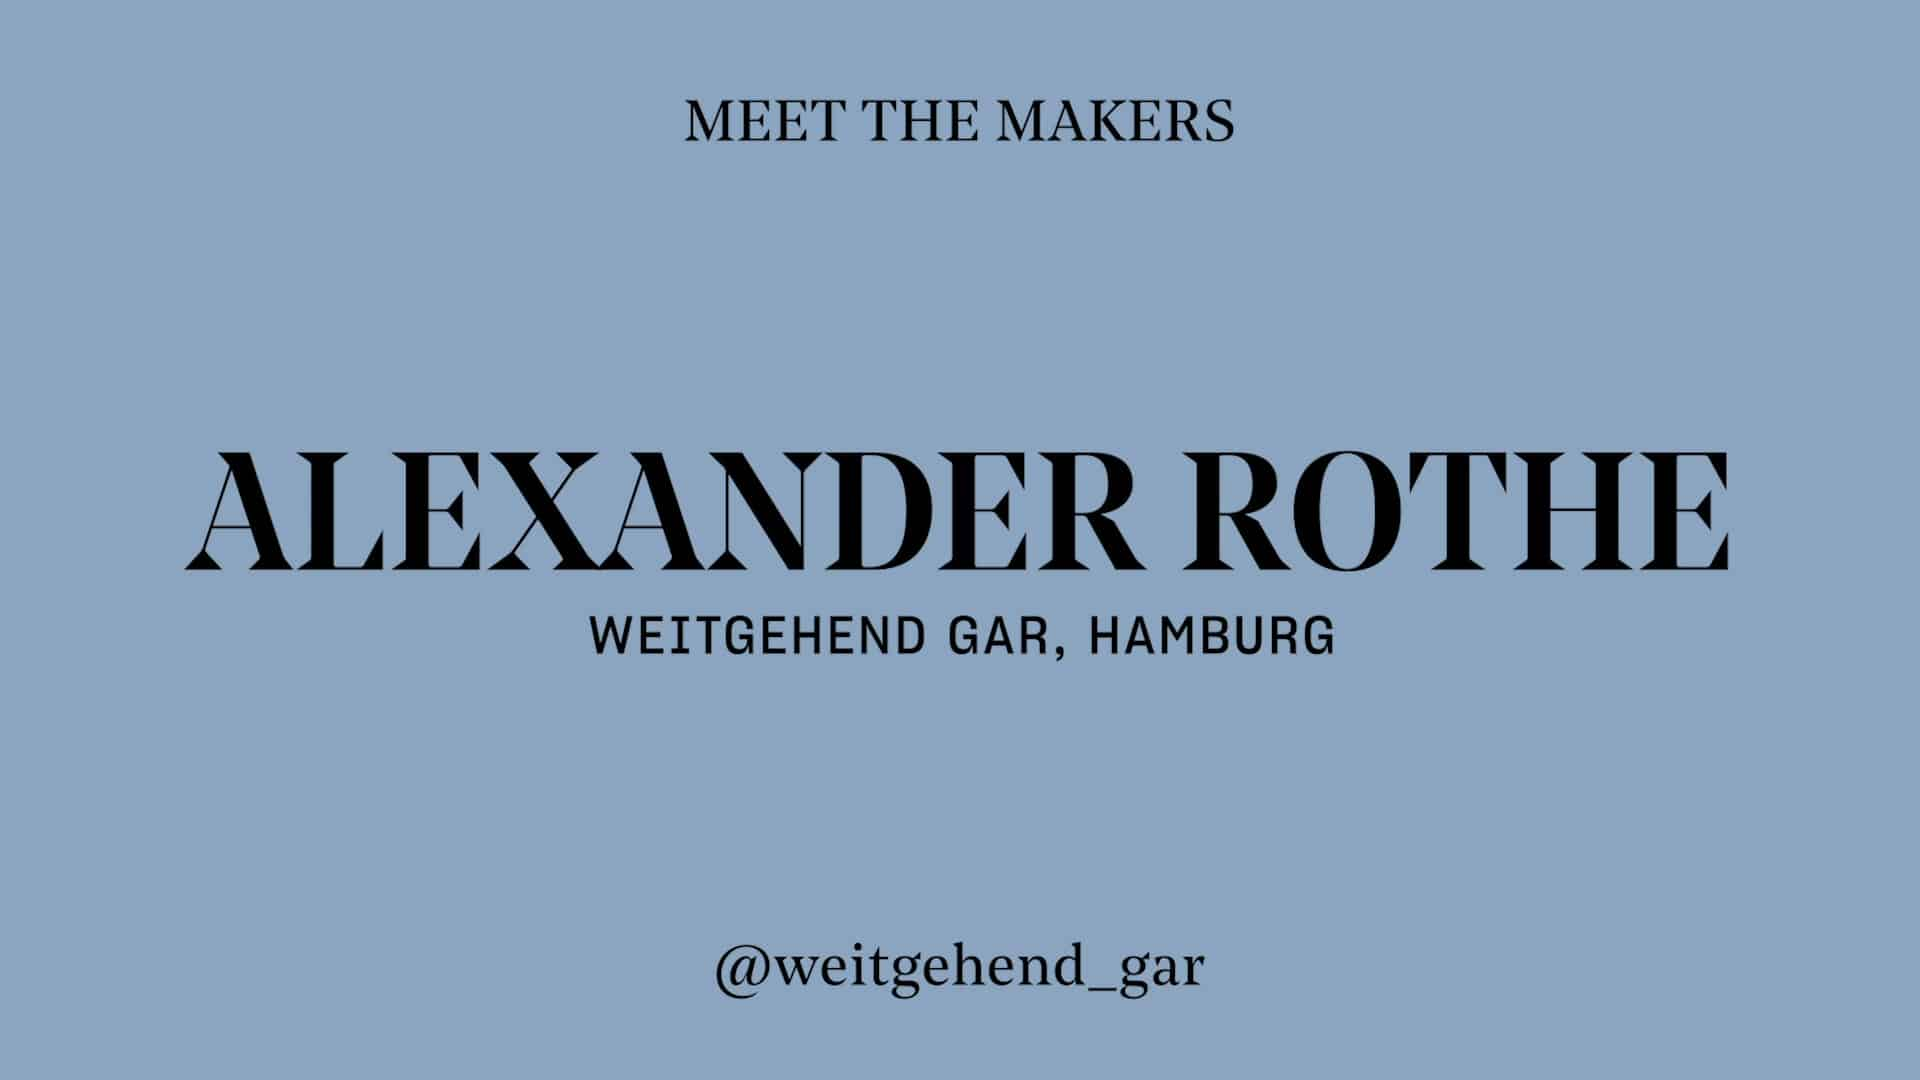 Alexander Rothe - Weitgehend Gar